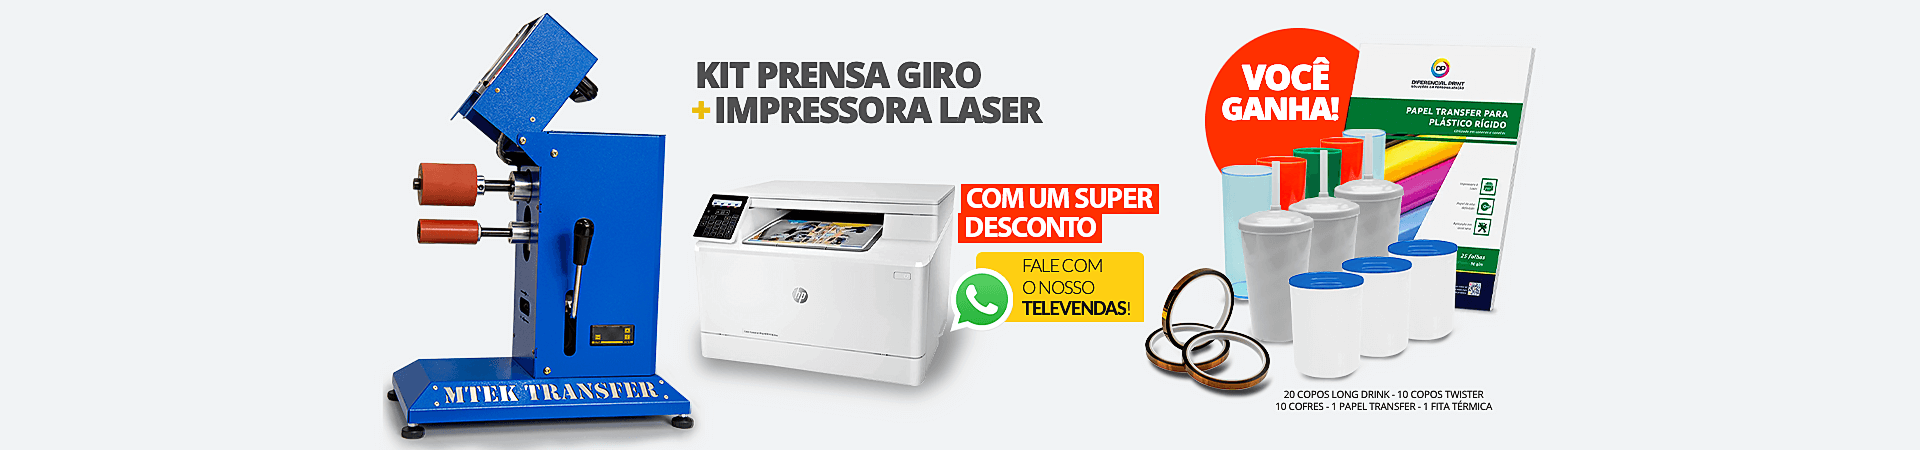 Kit Prensa Giro